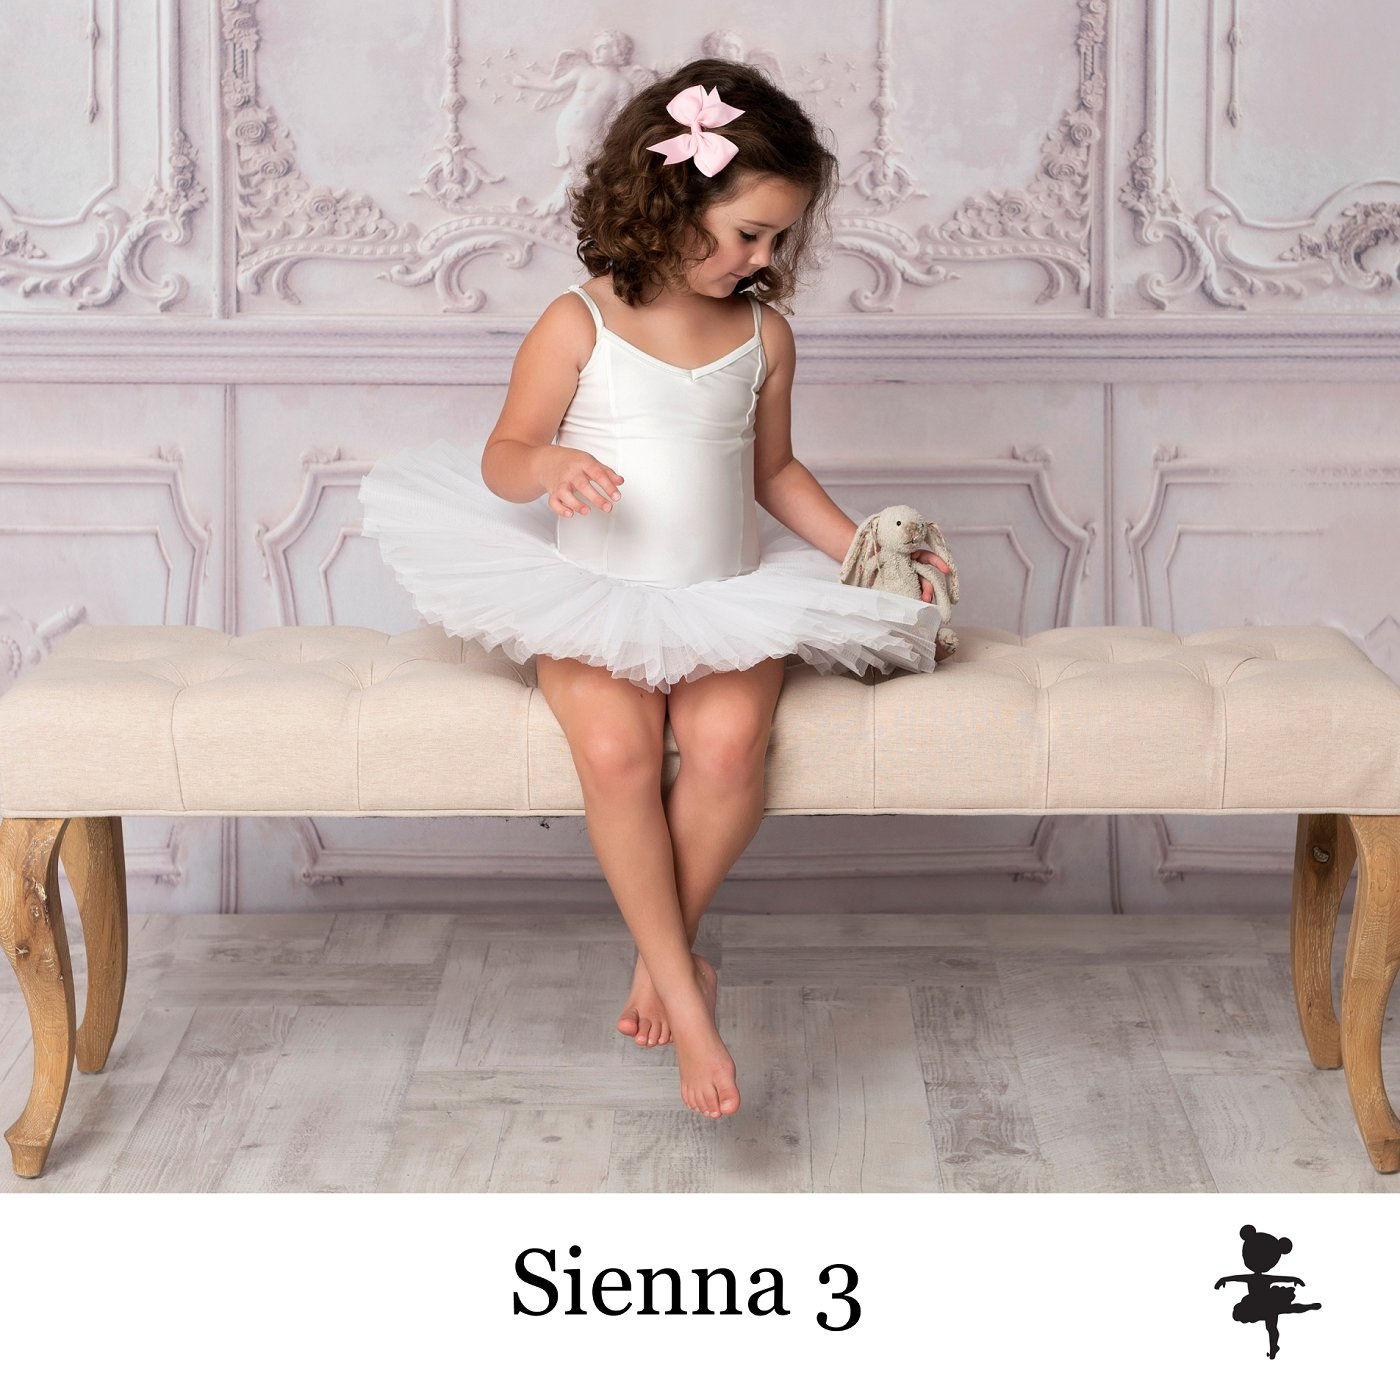 LB3919-Sienna3.jpg